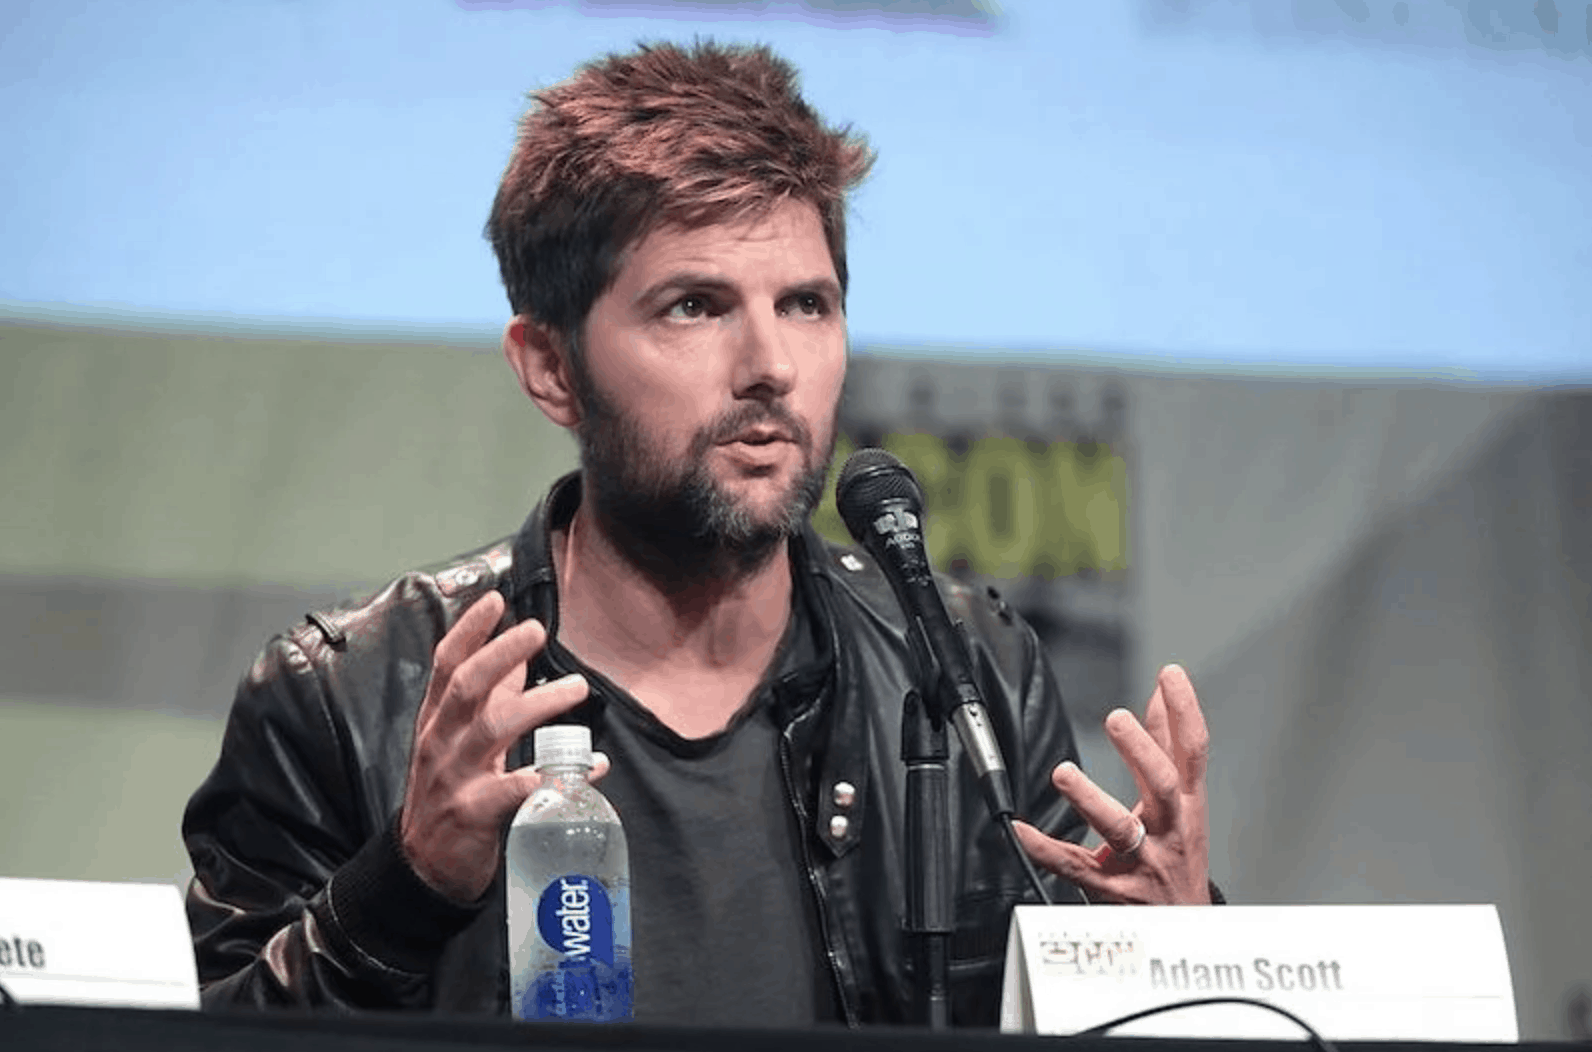 Apple TV+ Show 'Severance' Casts Adam Scott as Lead